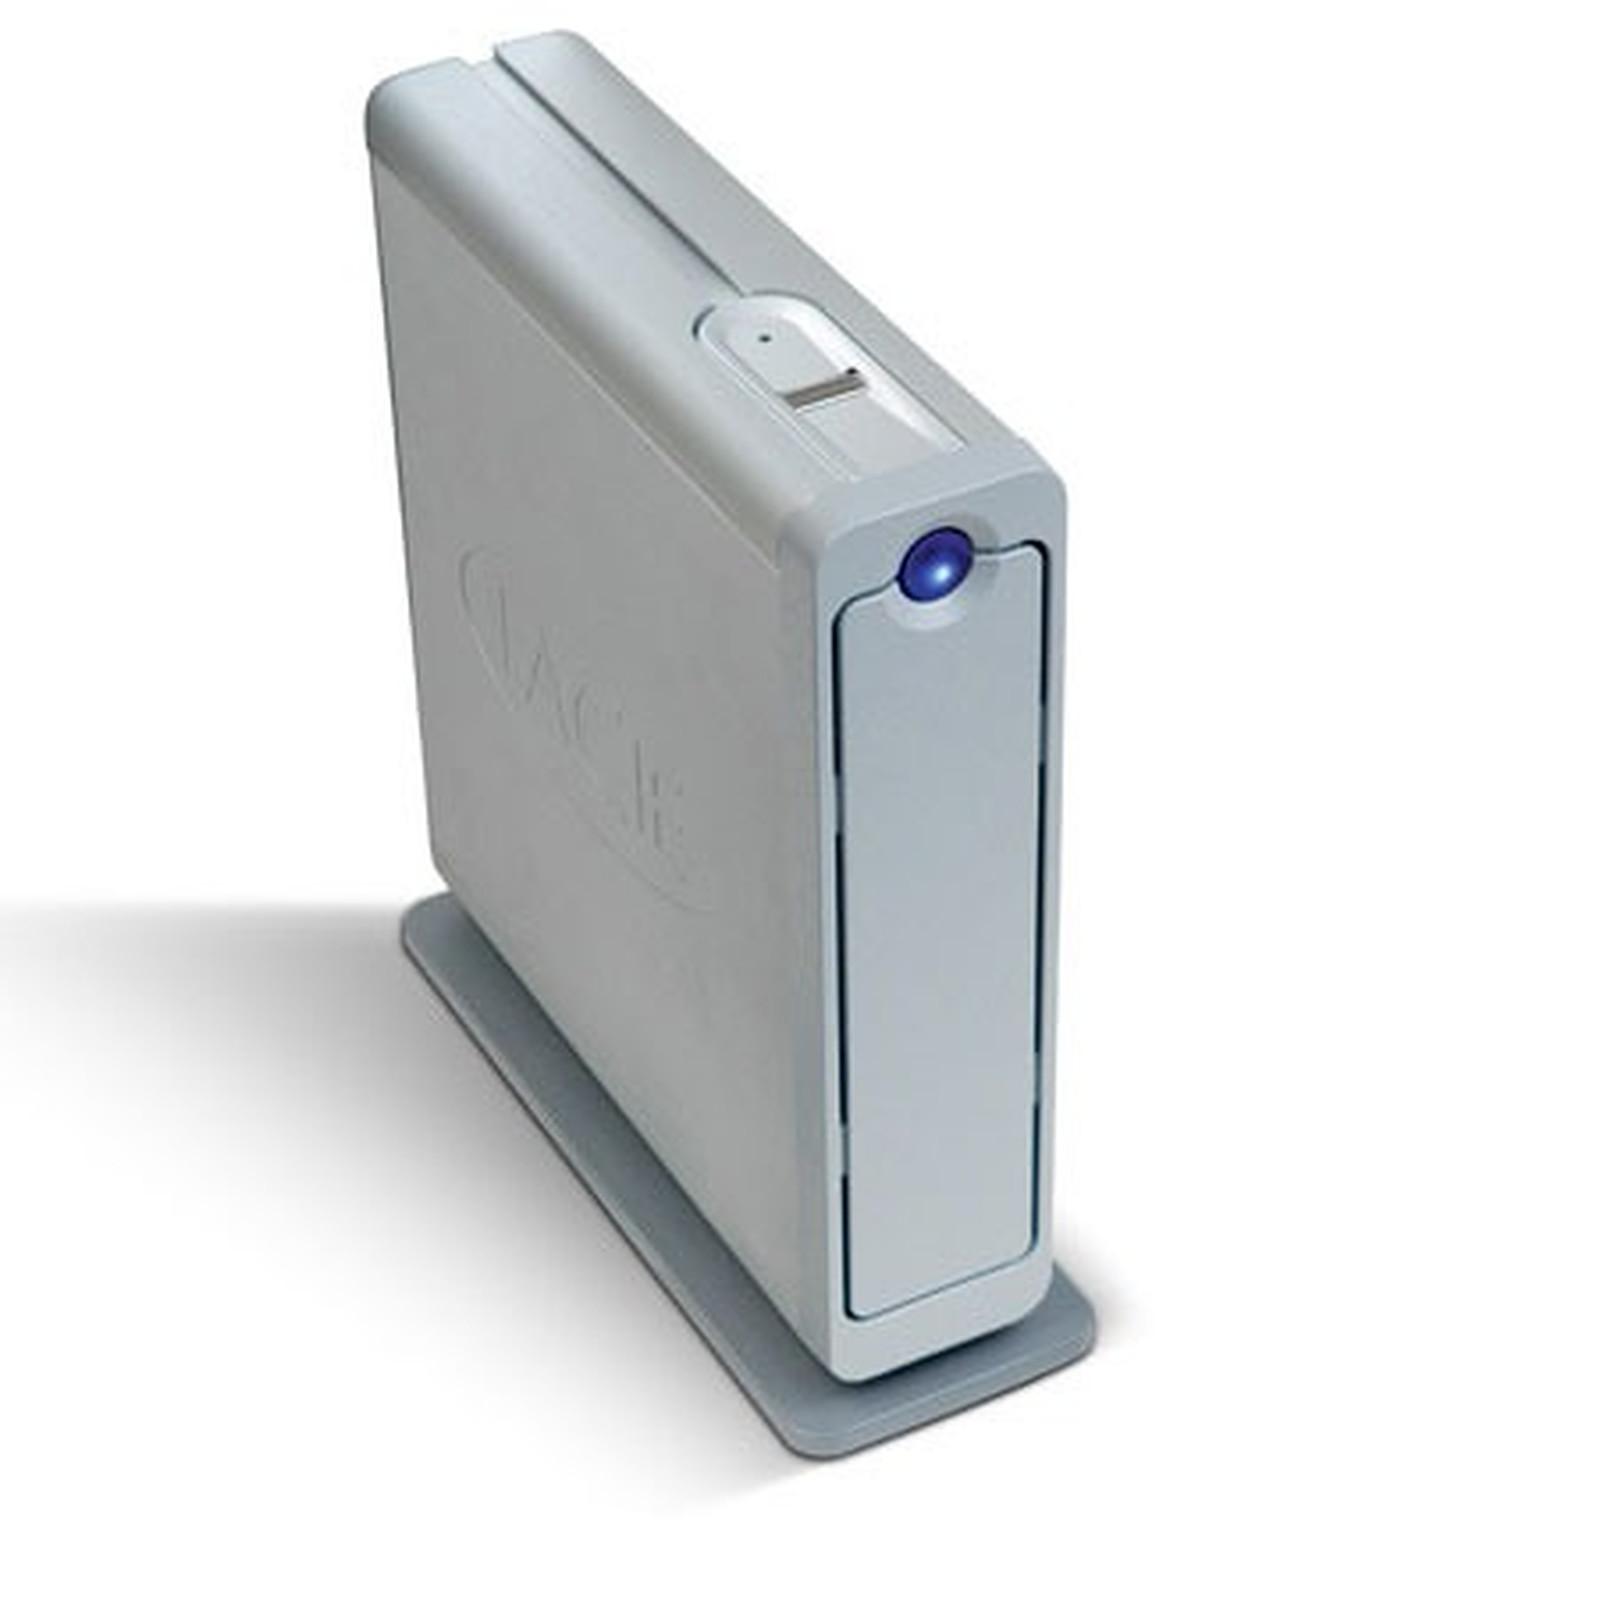 LaCie d2 SAFE Hard Drive 1 To (USB 2.0, FireWire 400 et FireWire 800 ...